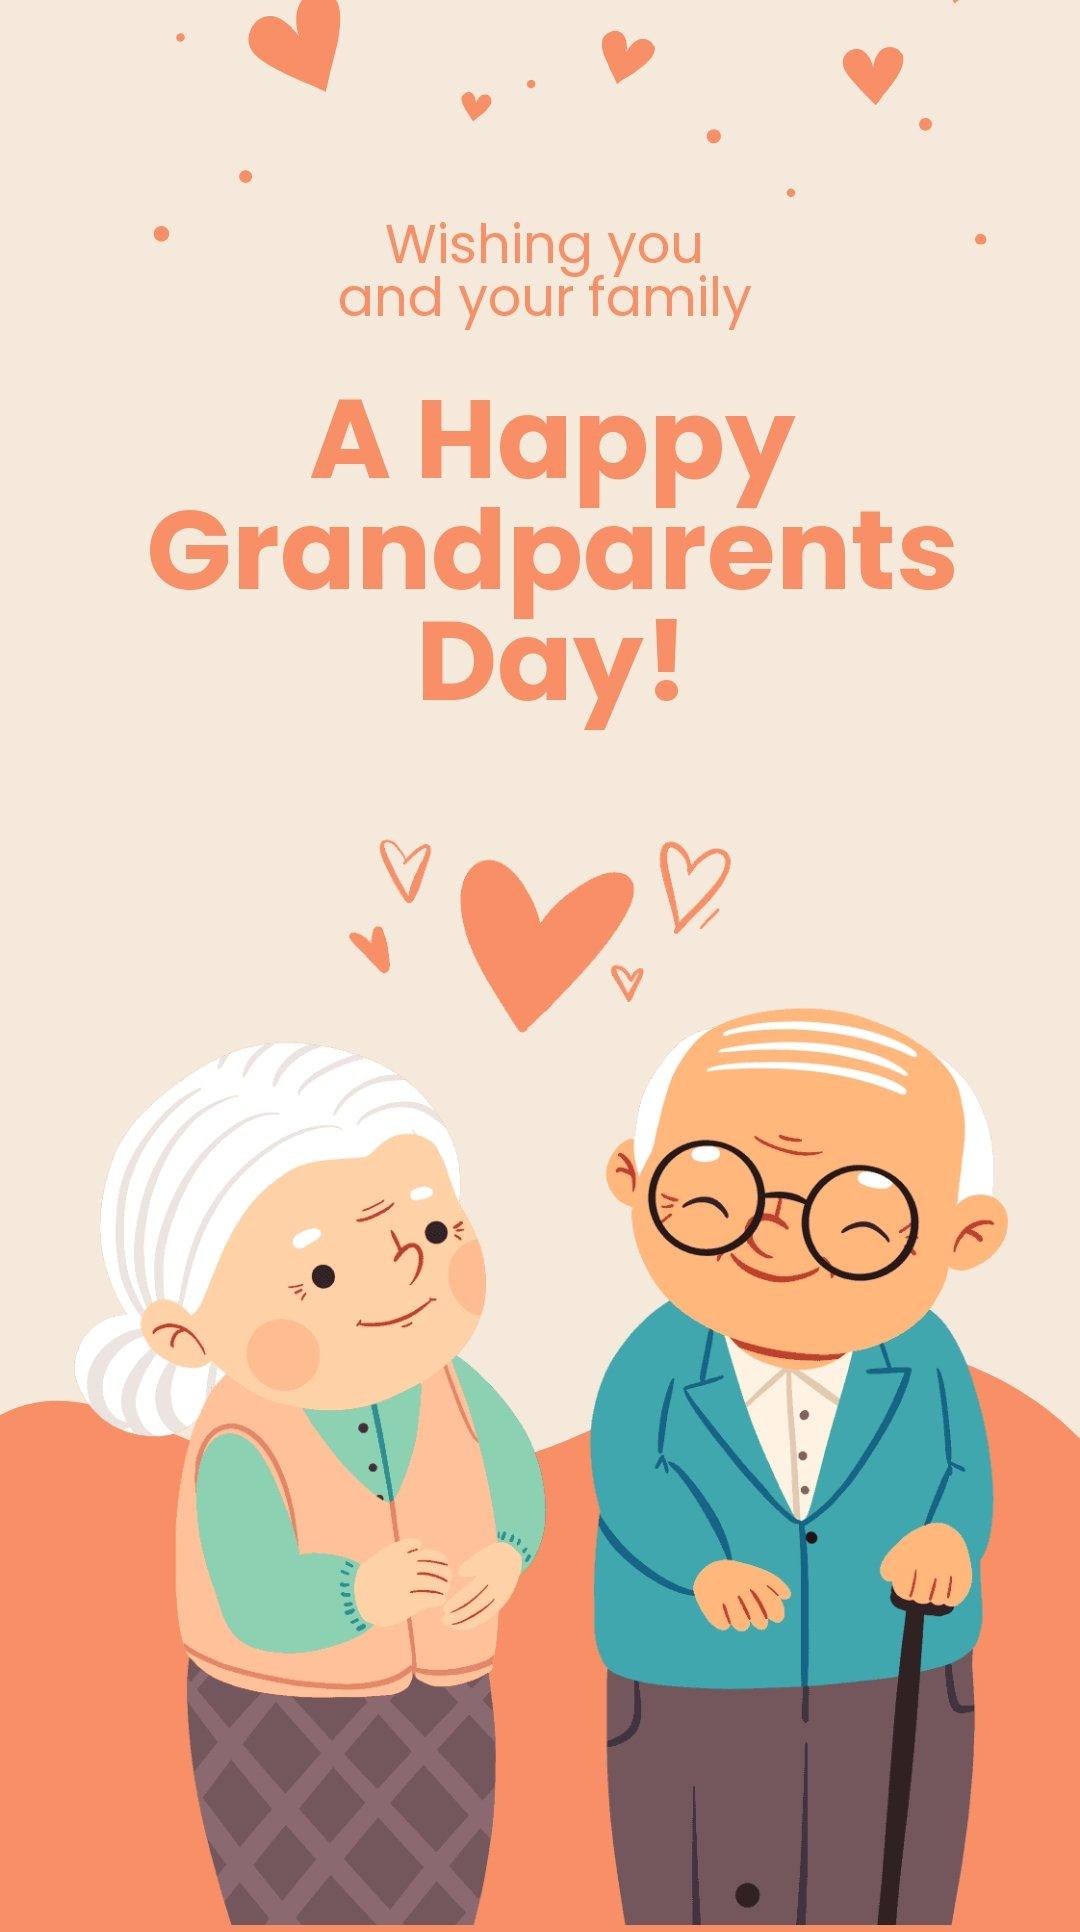 Happy Grandparents Day Whatsapp Post Template.jpe